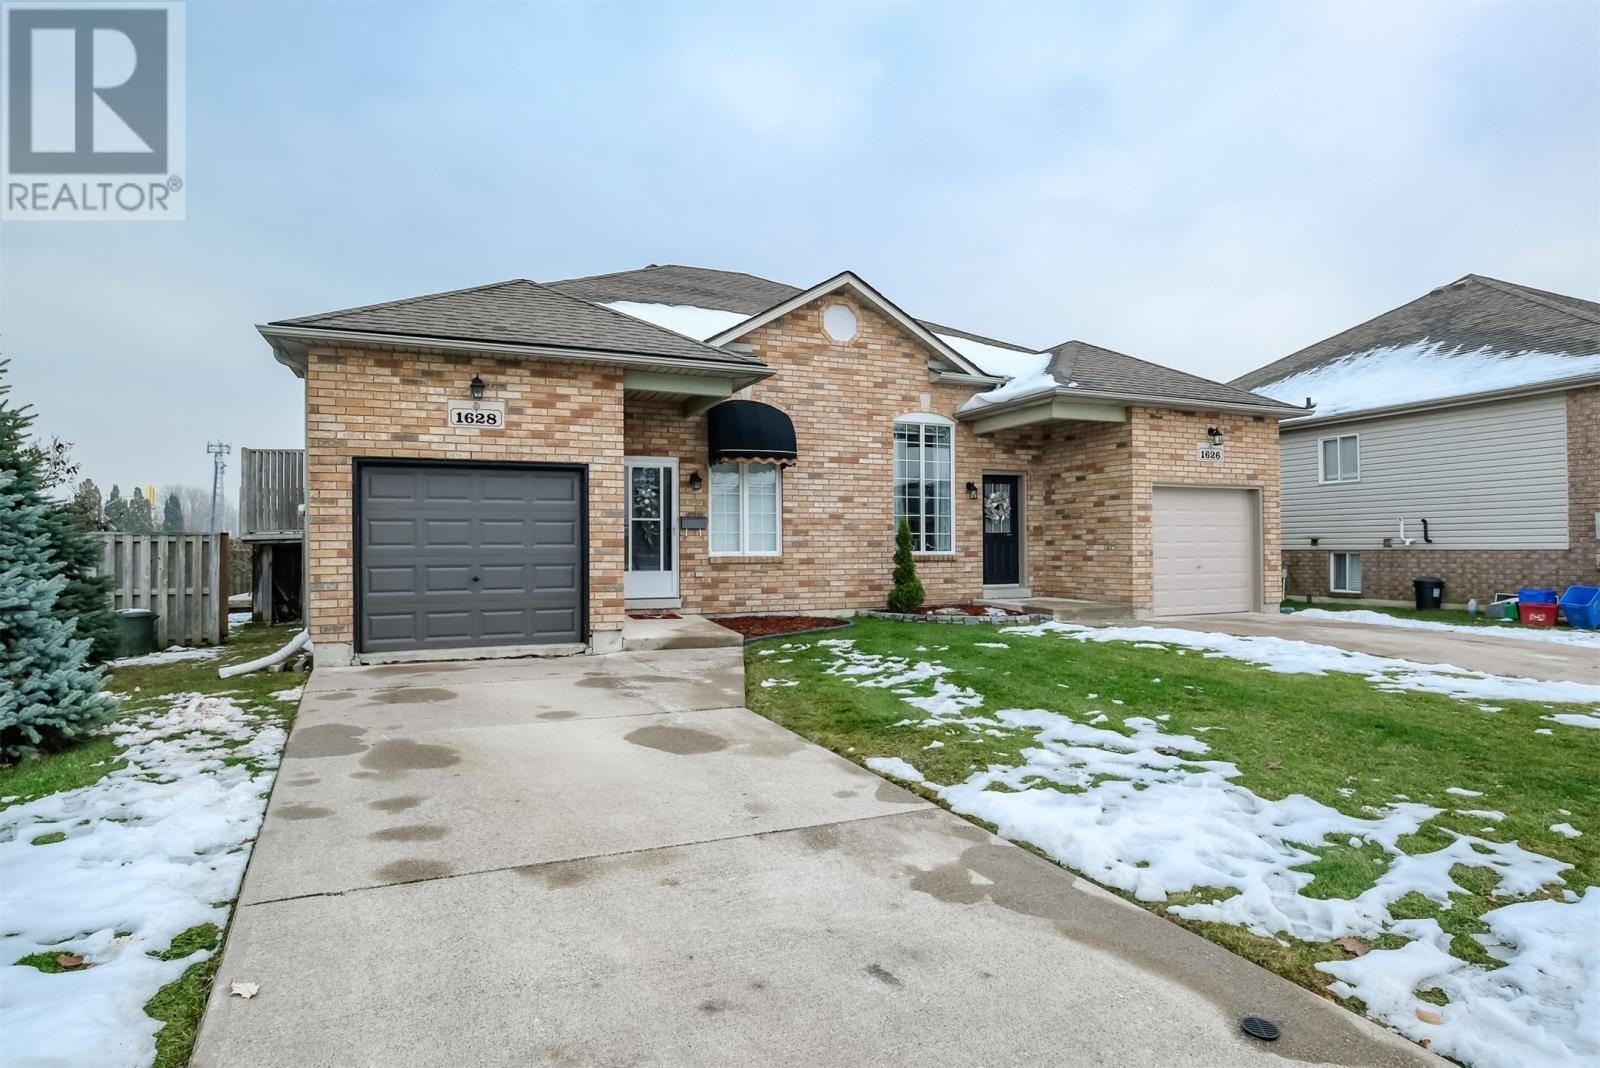 House for sale at 1628 Heatherglen  Tecumseh Ontario - MLS: 19028531